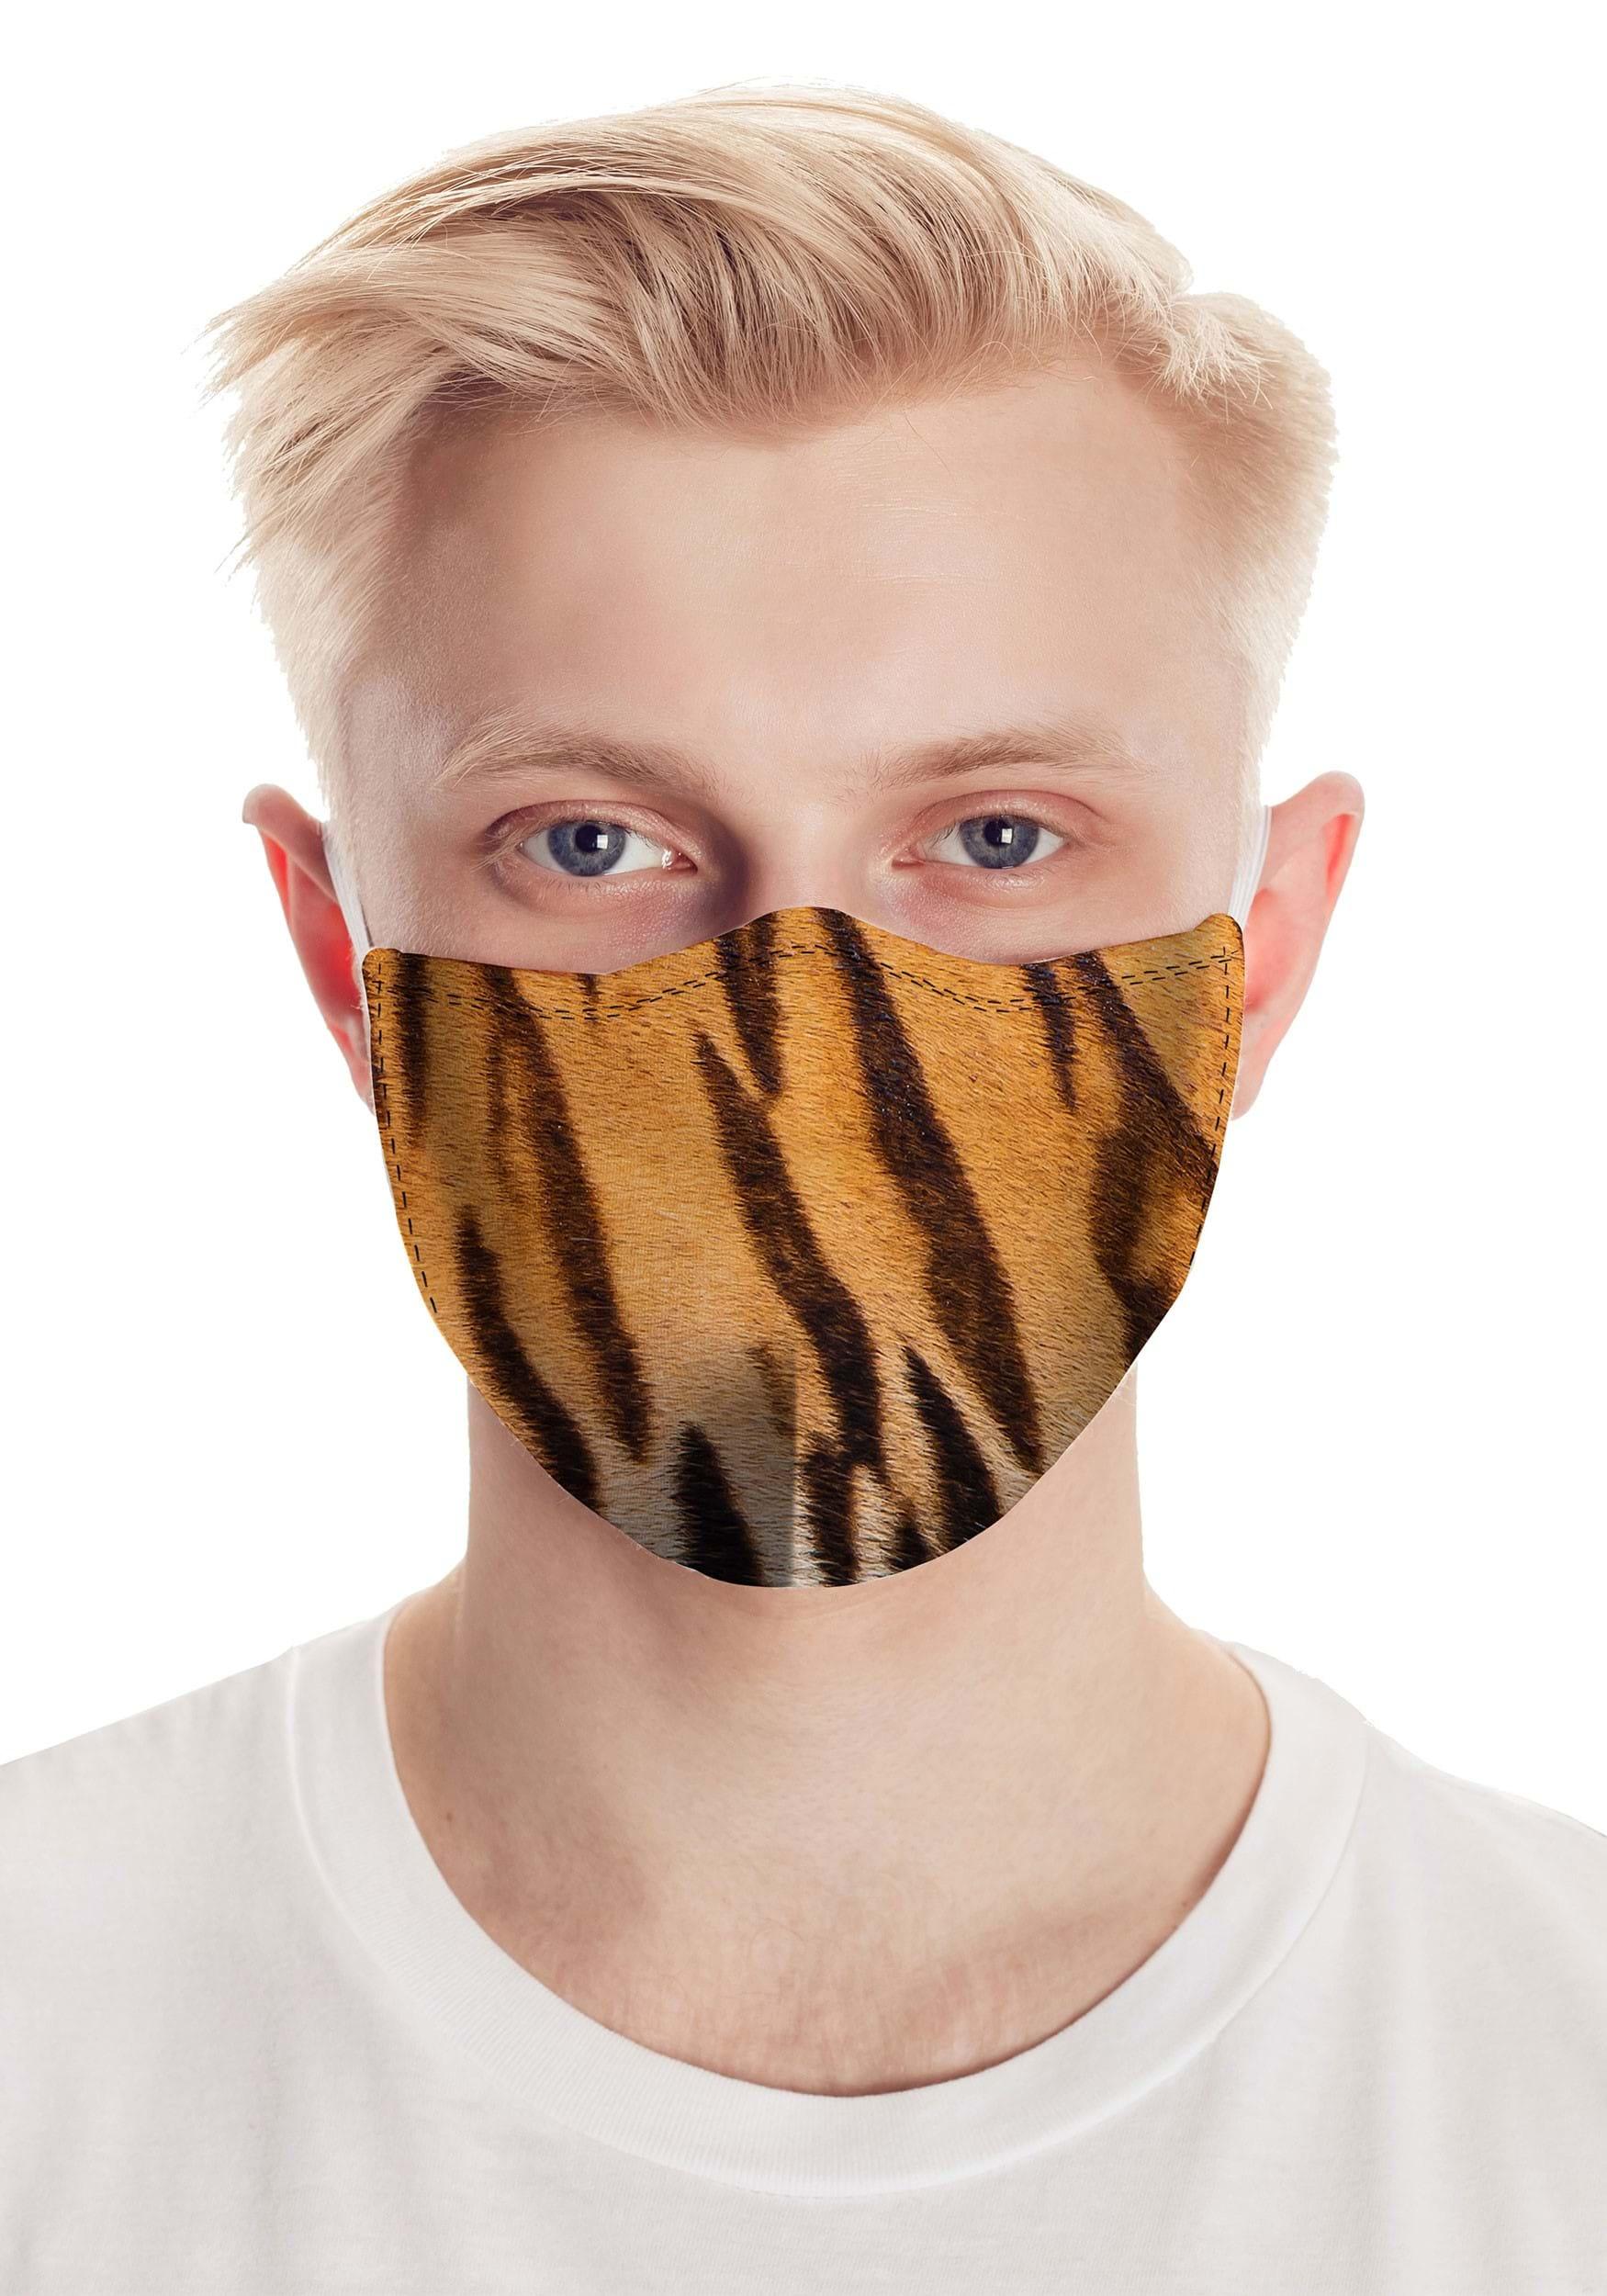 Tiger Stripes Safety Face Mask